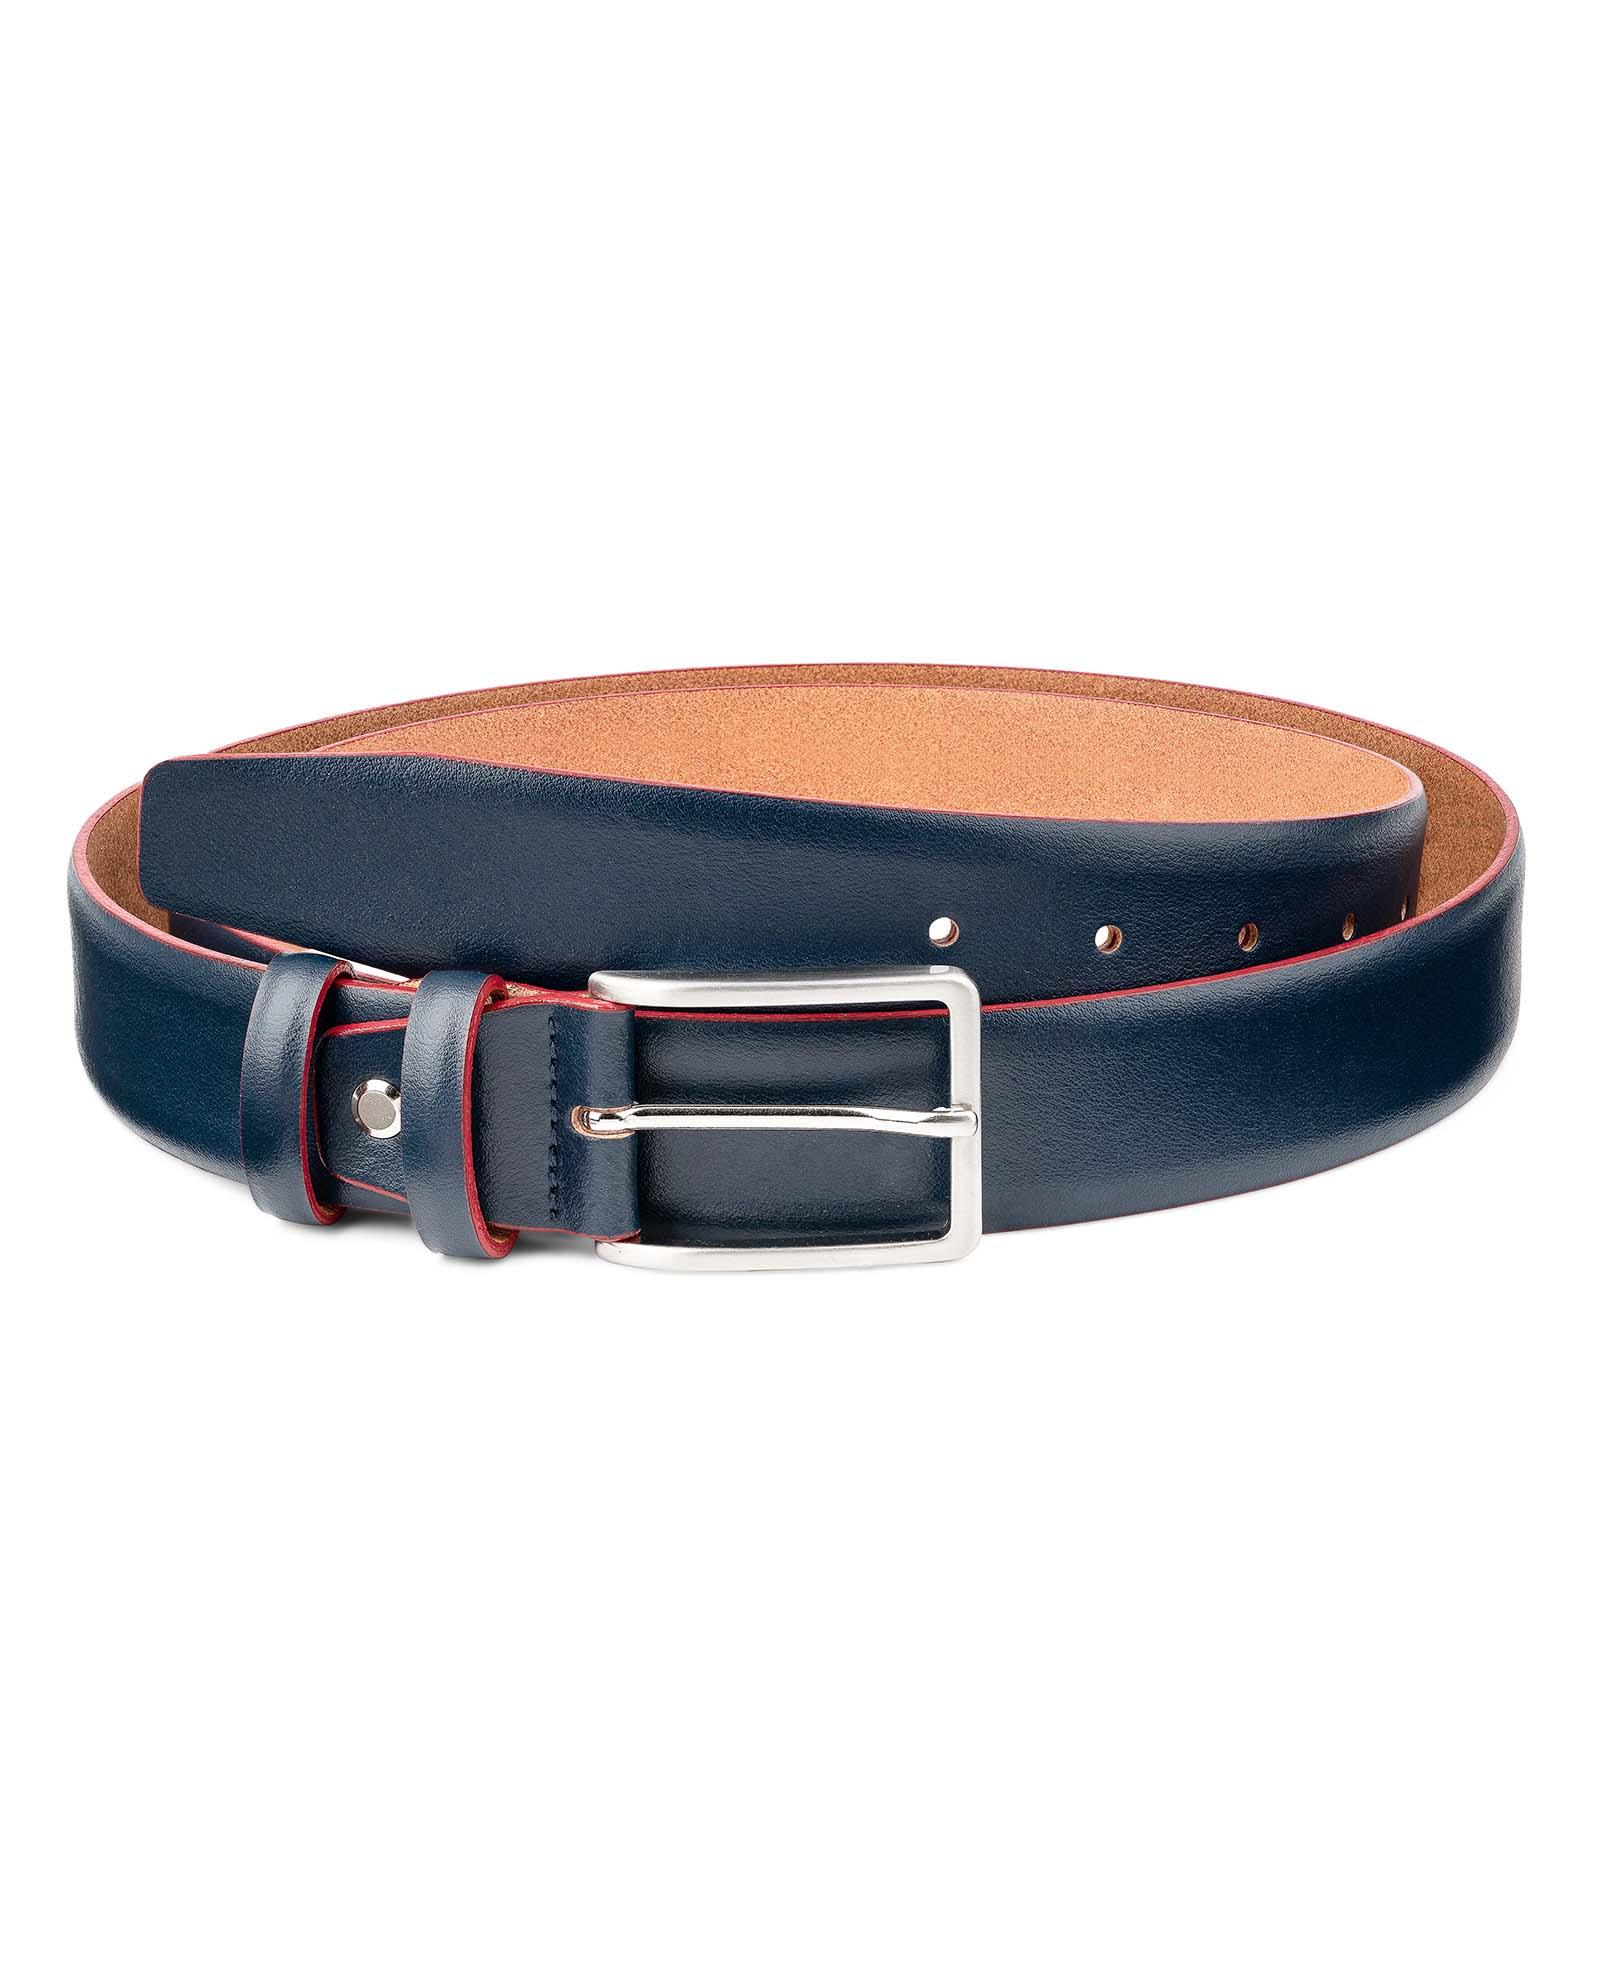 Capo Pelle Men/'s Belts Navy blue Red edges Genuine Italian Leather Buckles Sz 34